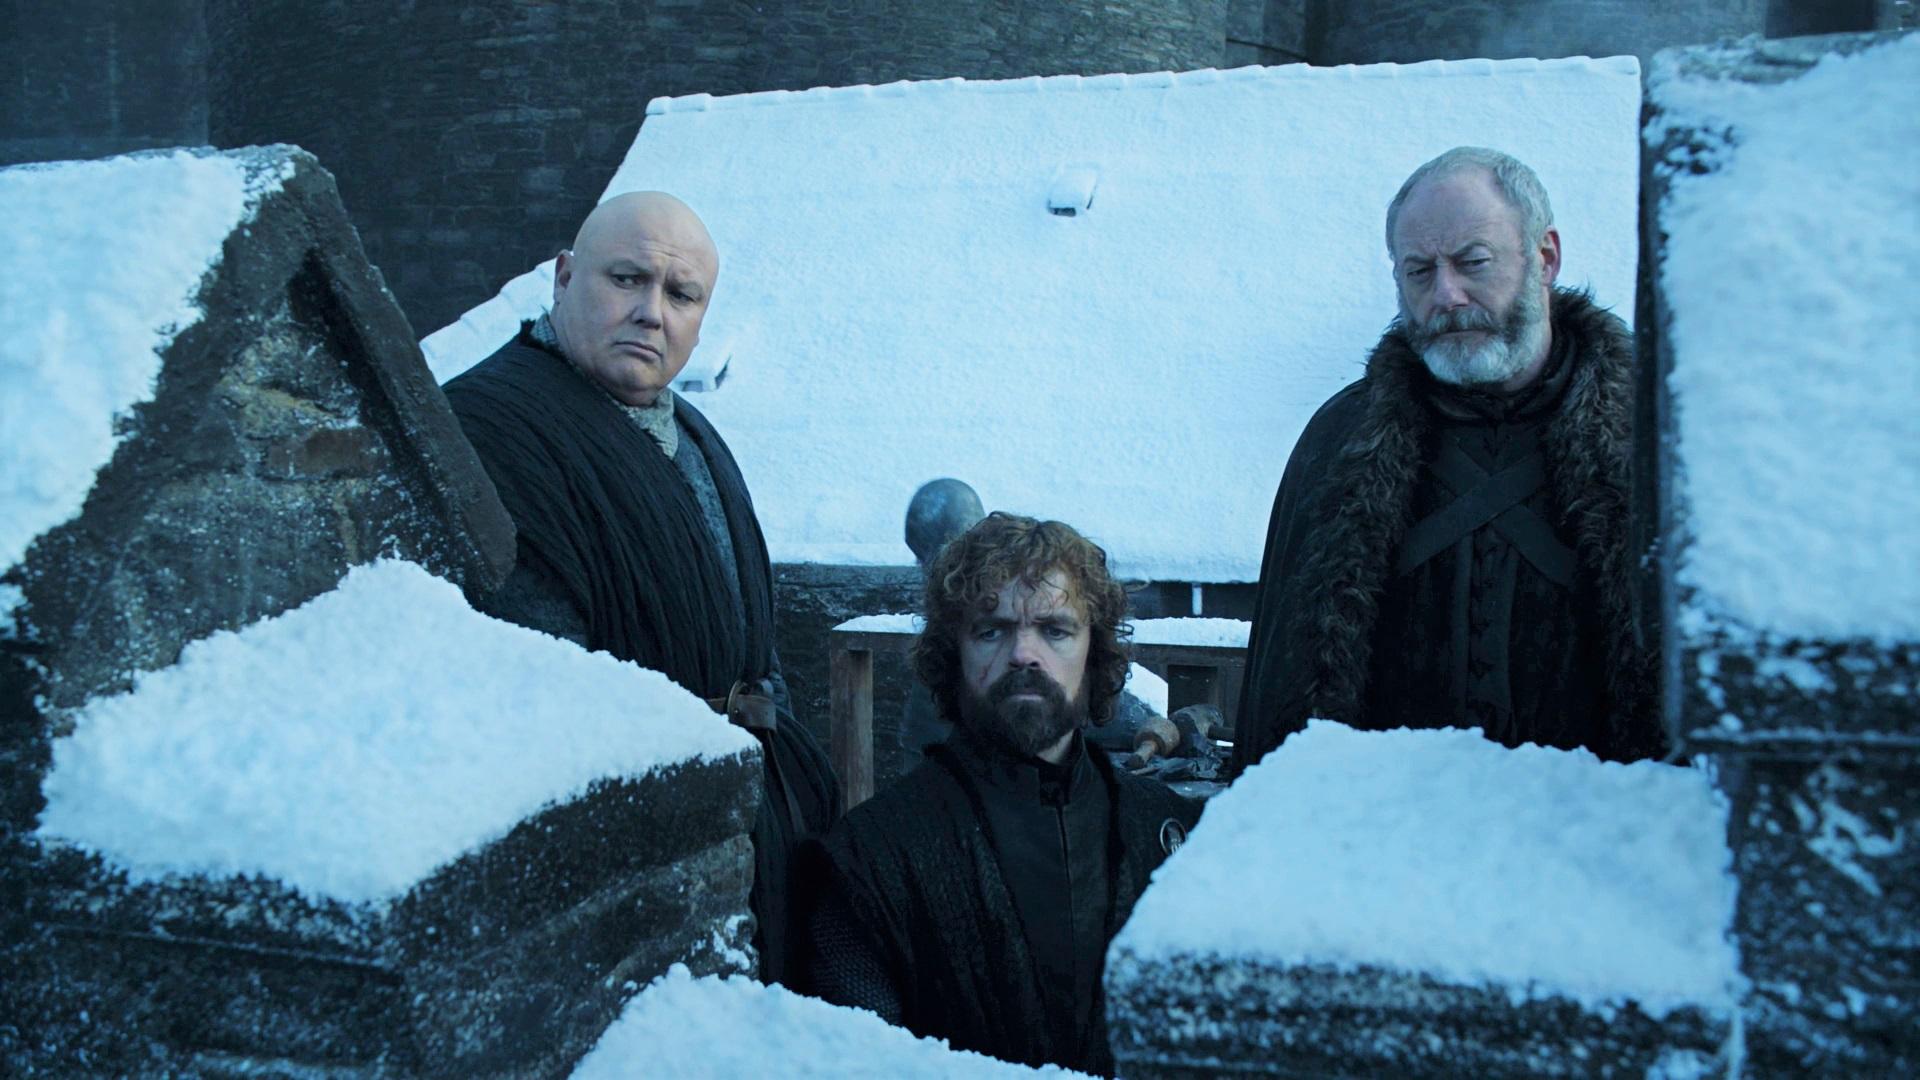 Varys Tyrion Lannister Davos Seaworth Season 8 801